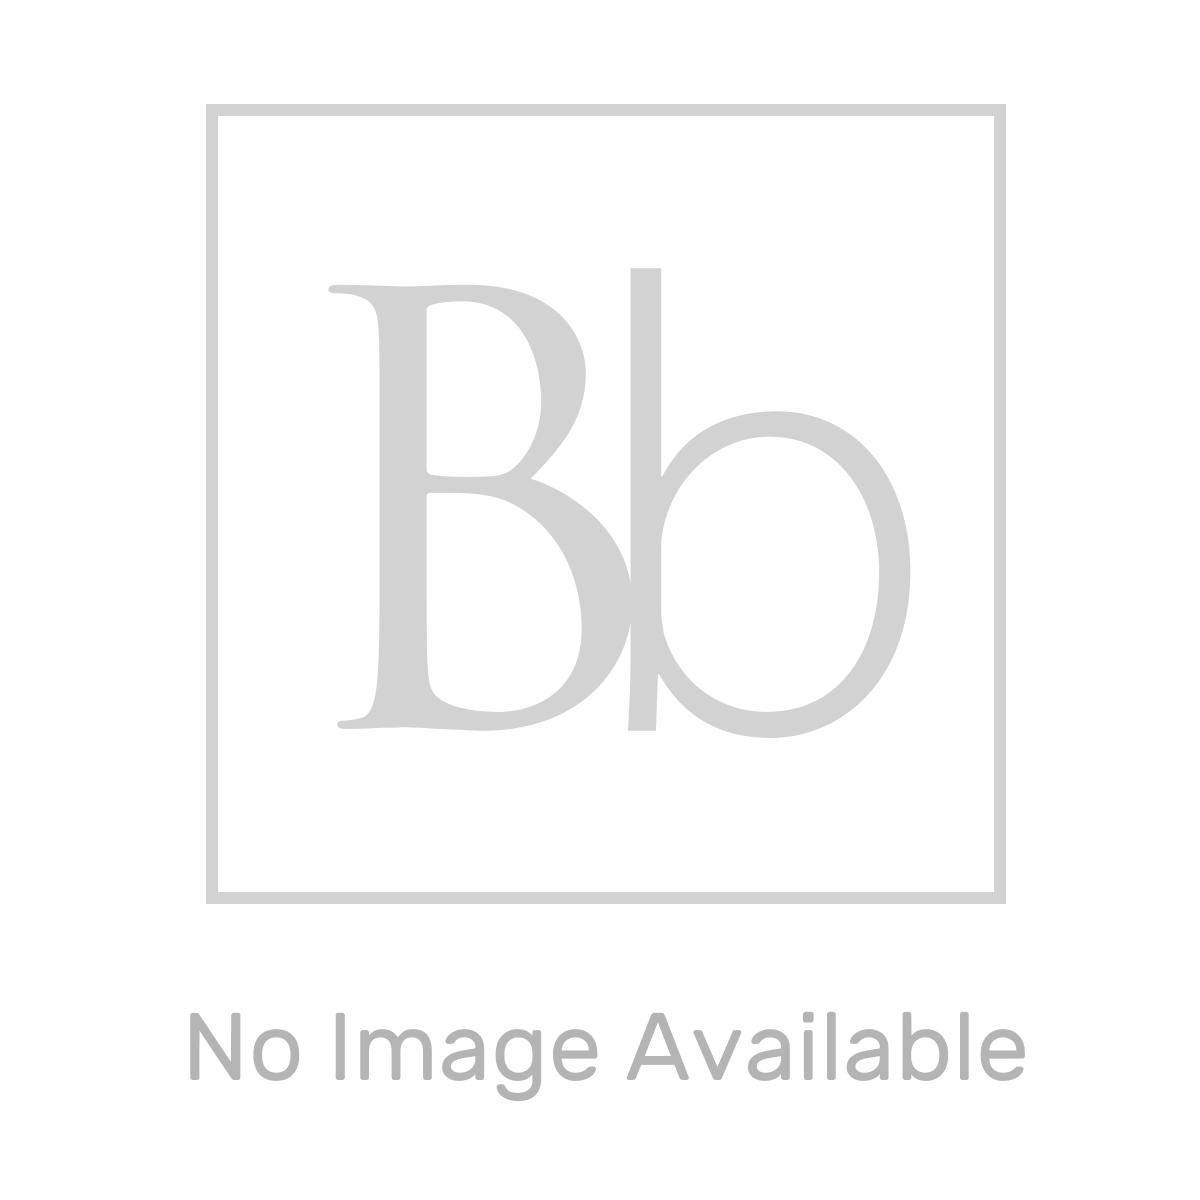 Nuie Athena Hacienda Black 2 Drawer Wall Hung Vanity Unit with 18mm Worktop 500mm Line Drawing